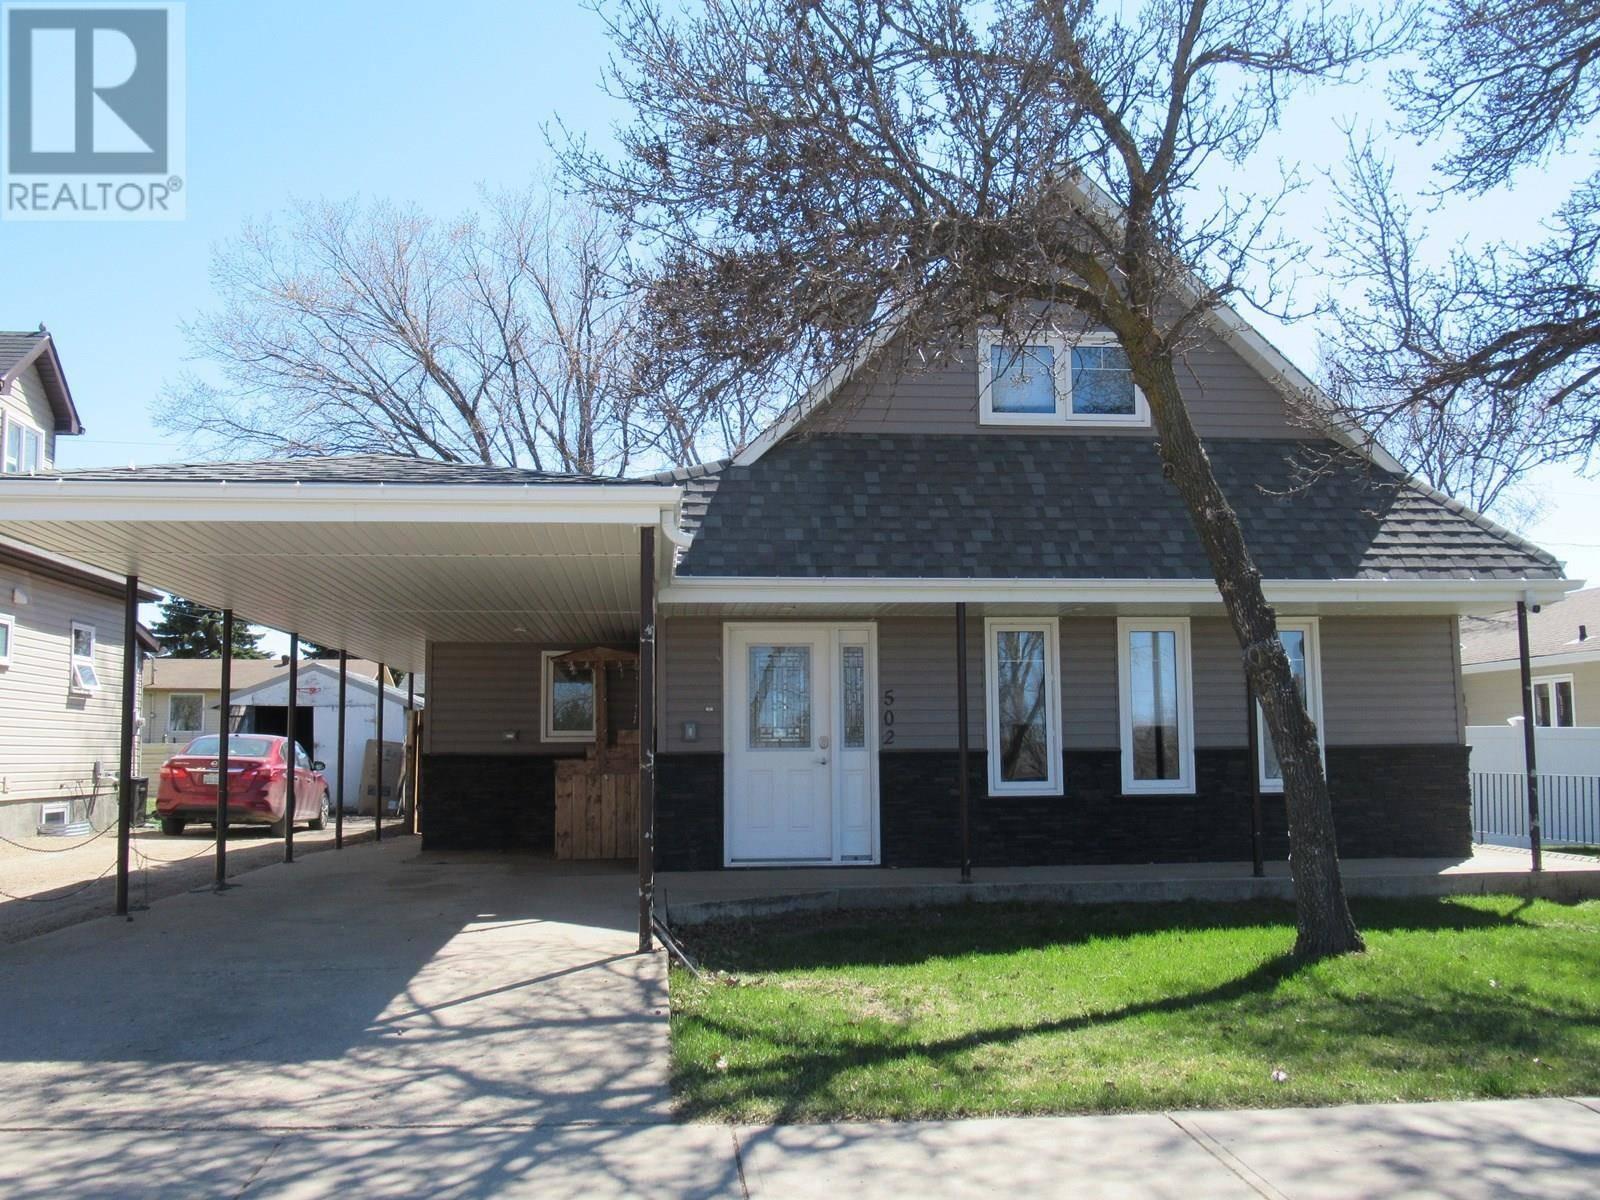 House for sale at 502 6th Ave E Assiniboia Saskatchewan - MLS: SK771382